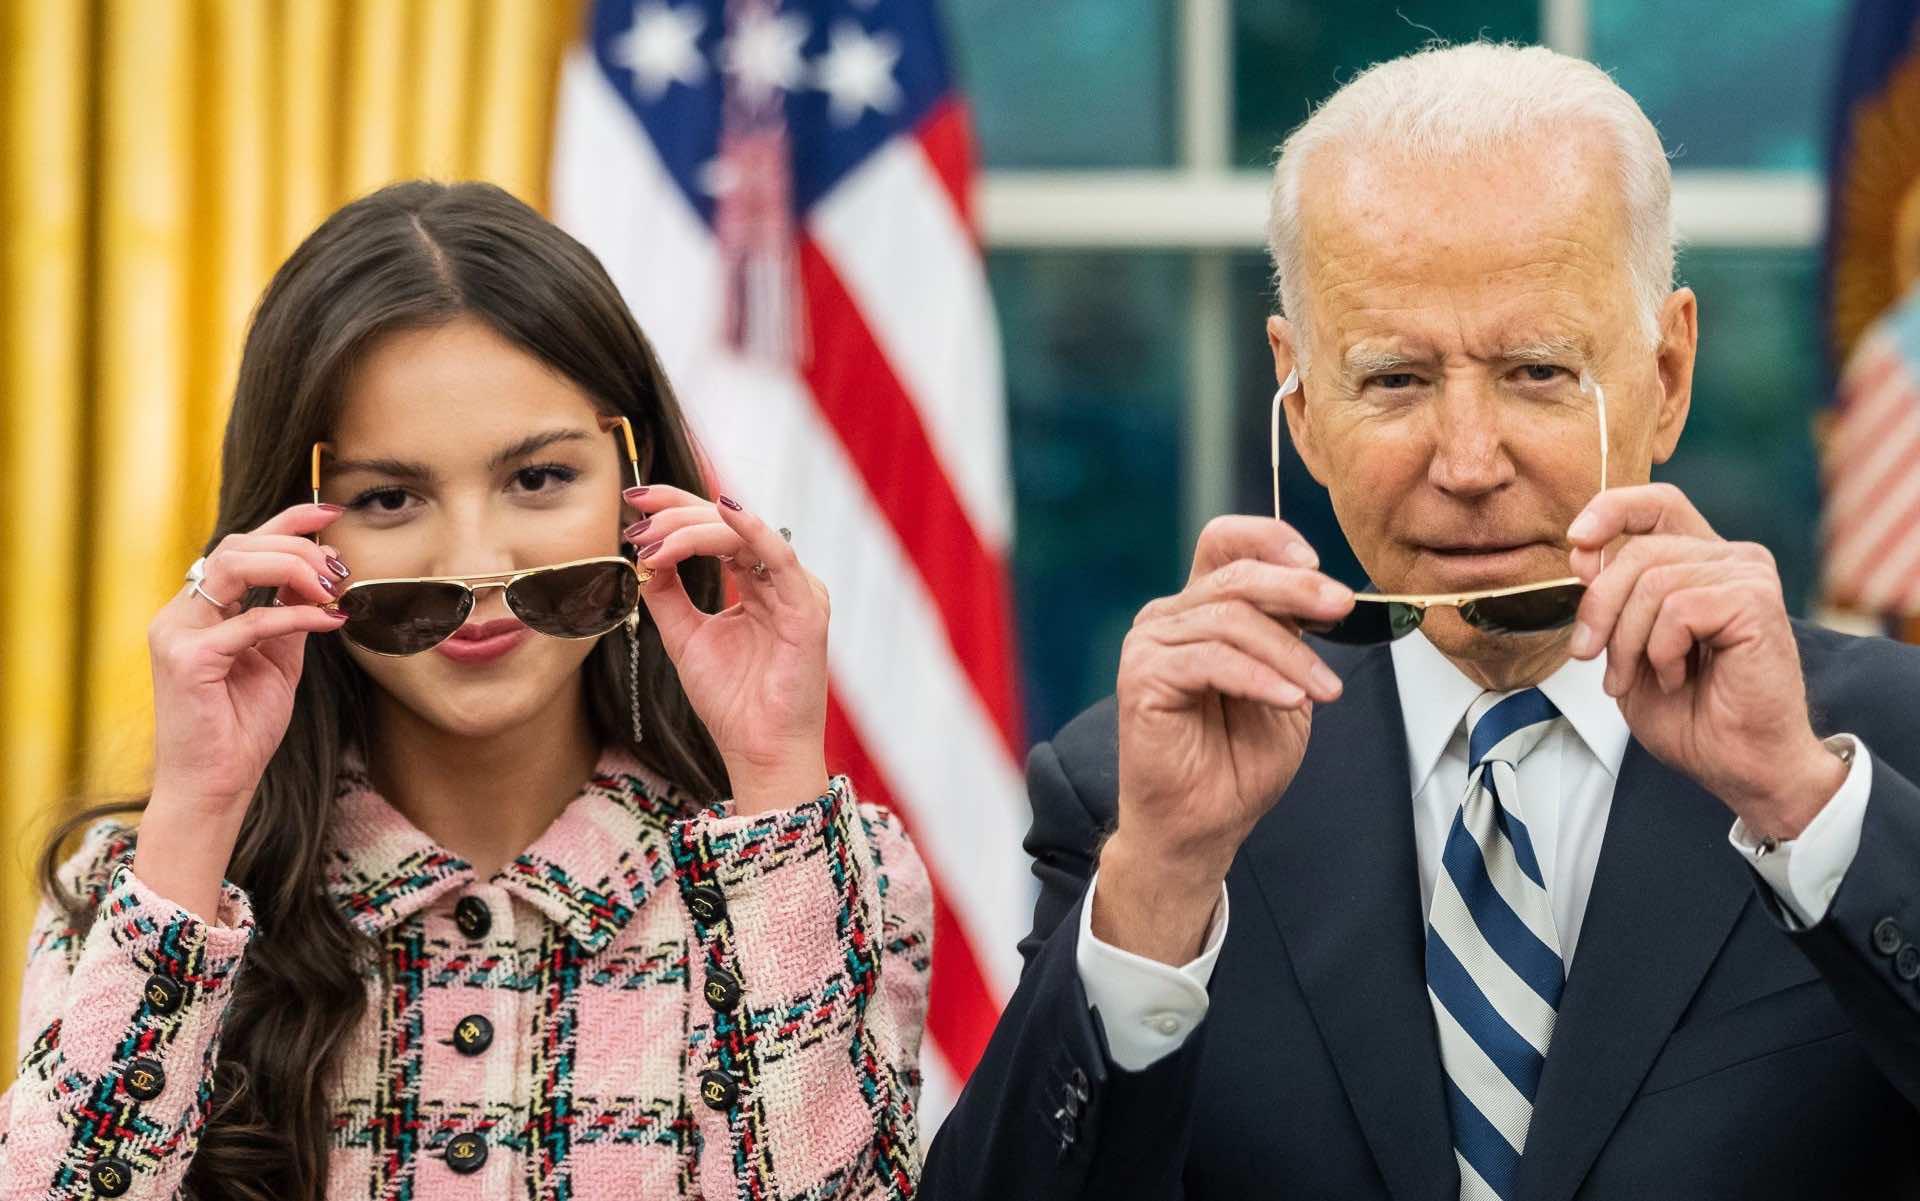 Olivia Rodrigo and Joe Biden putting on sunglasses at the White House.